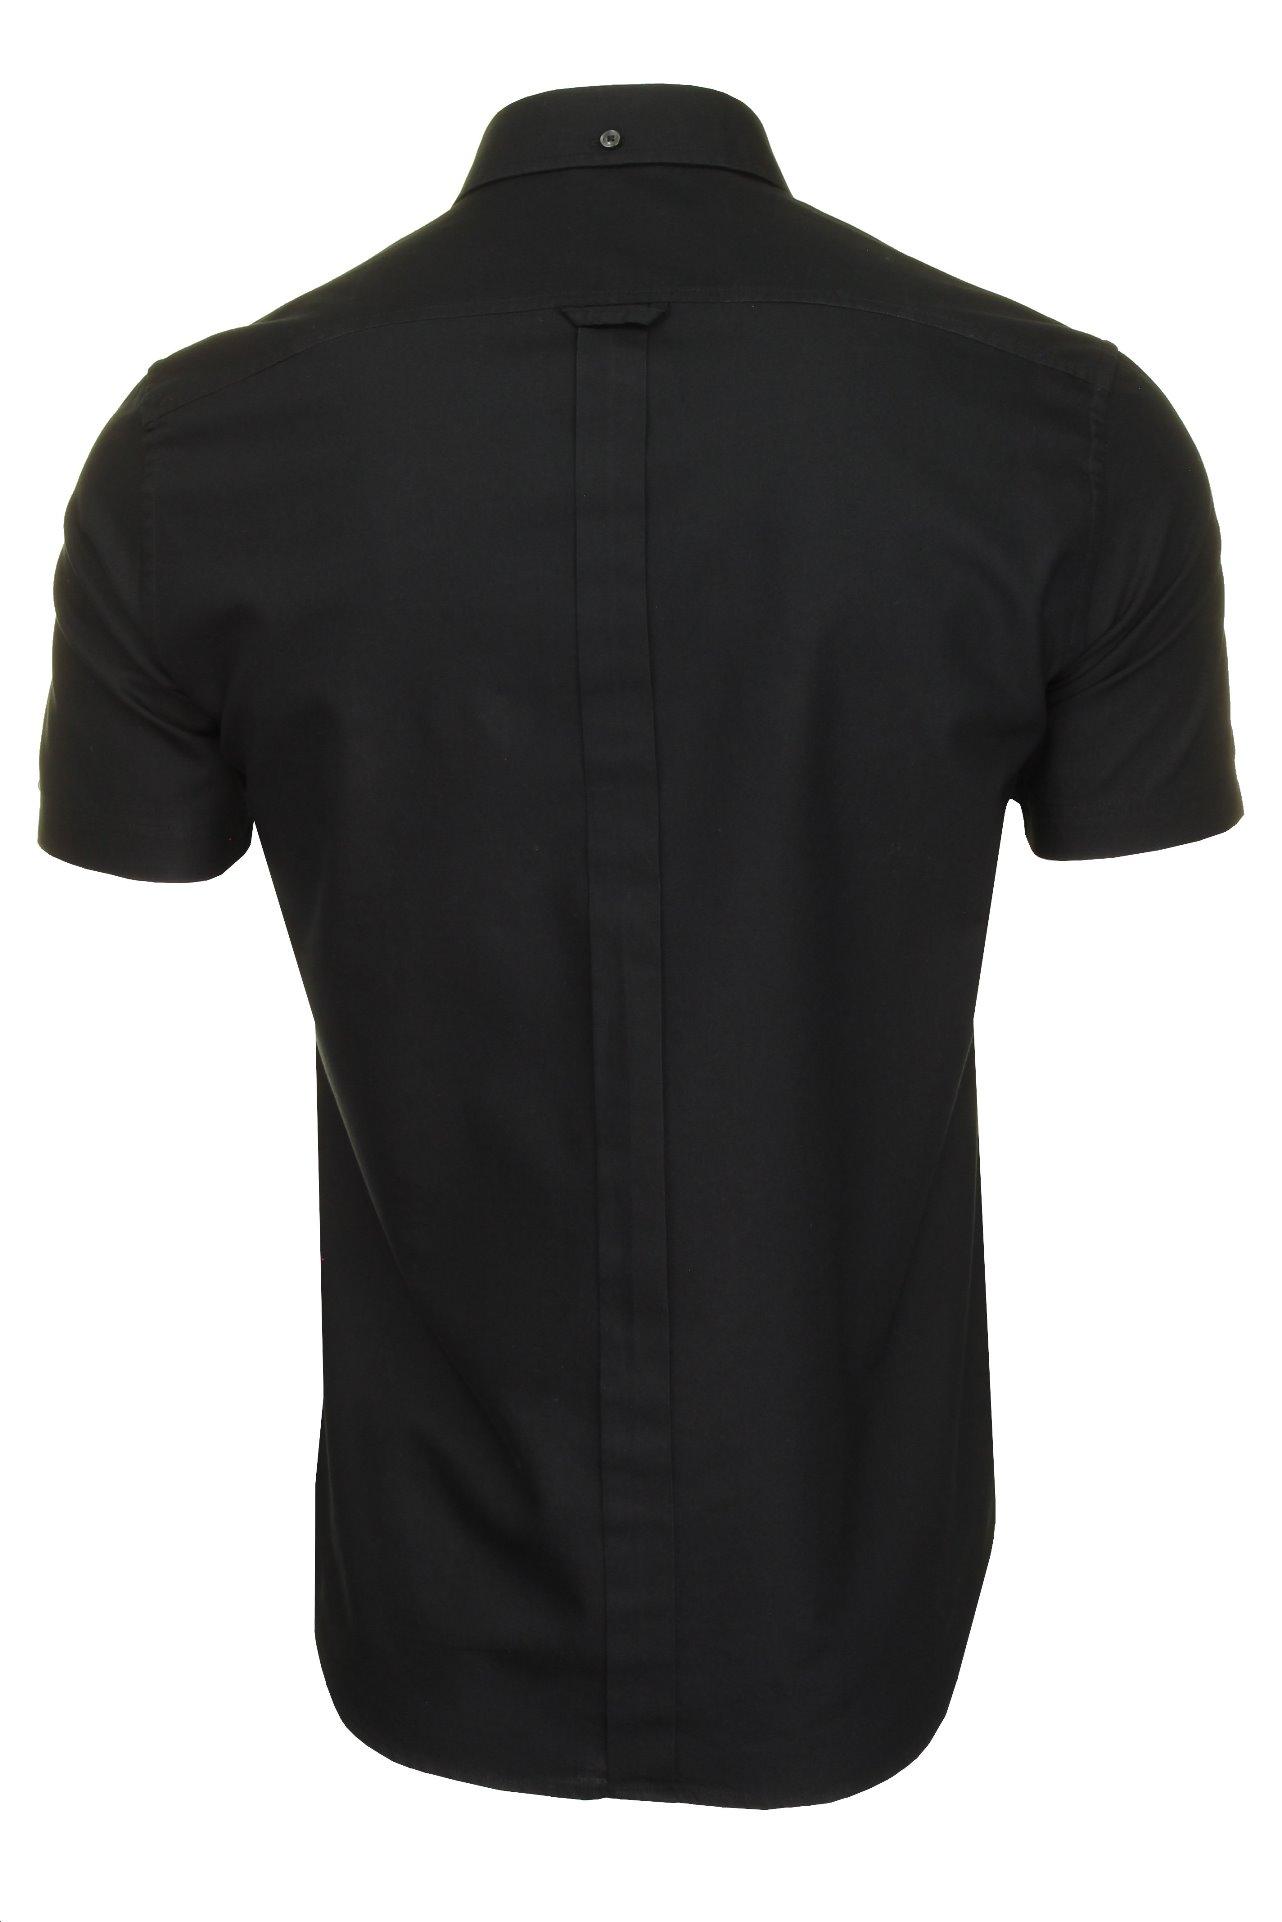 Ben-Sherman-Mens-Oxford-Shirt-Short-Sleeve thumbnail 8